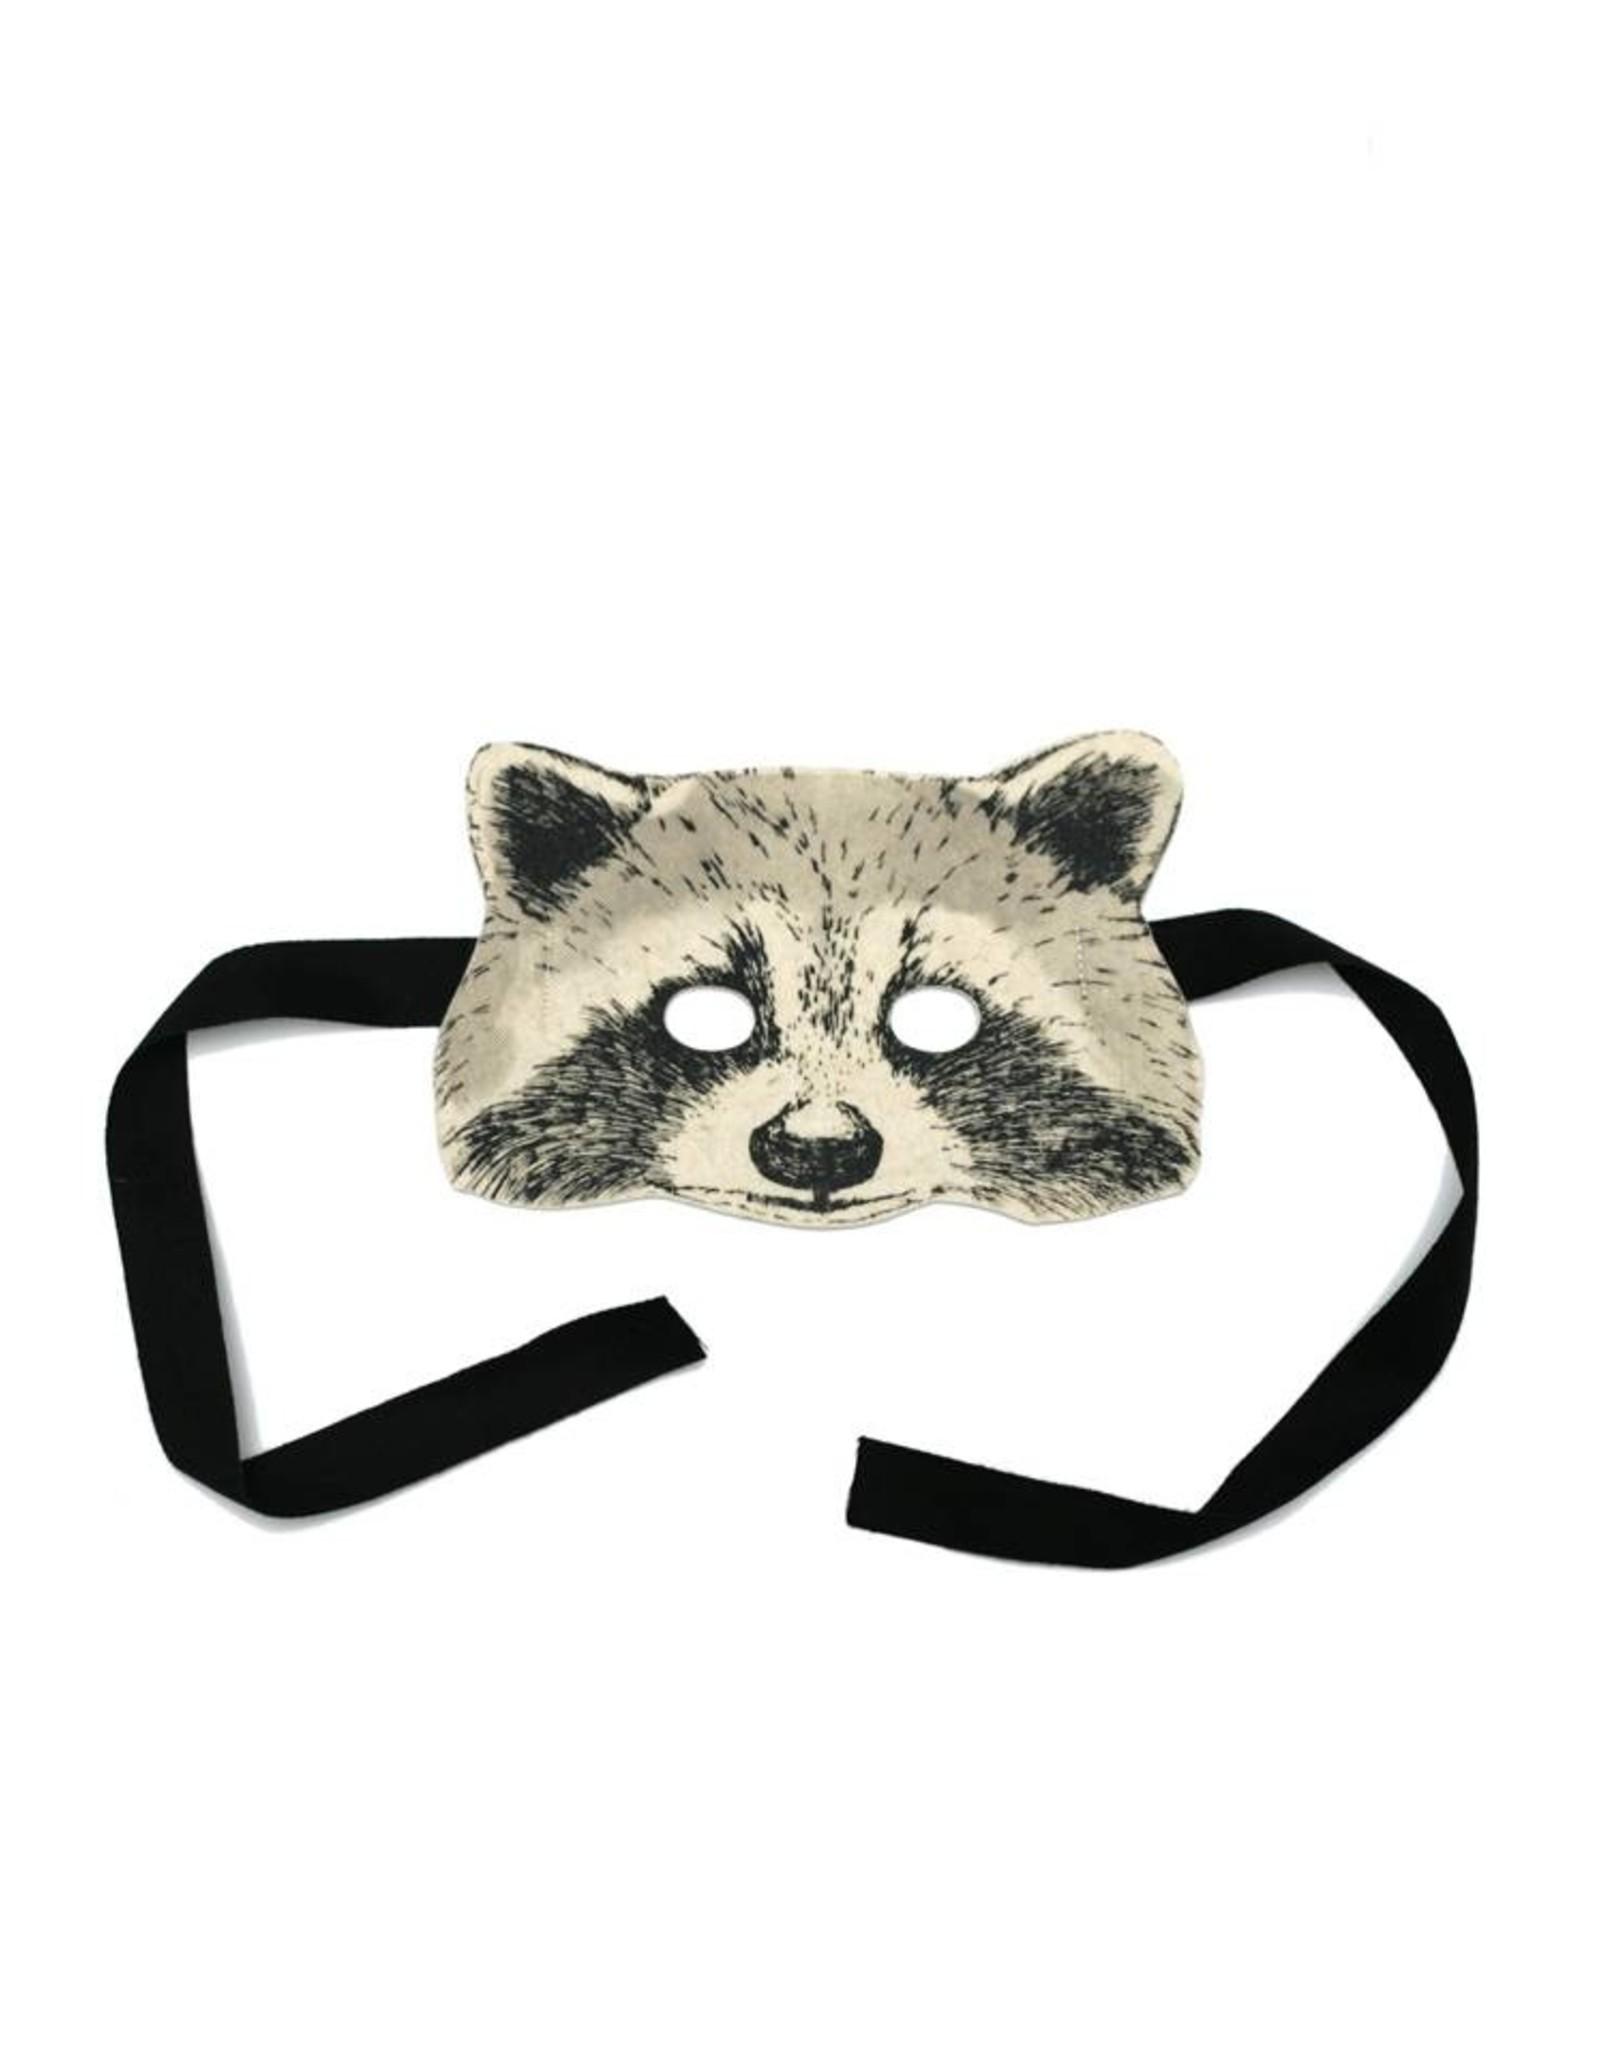 Frida's Tierchen Racoon Mask